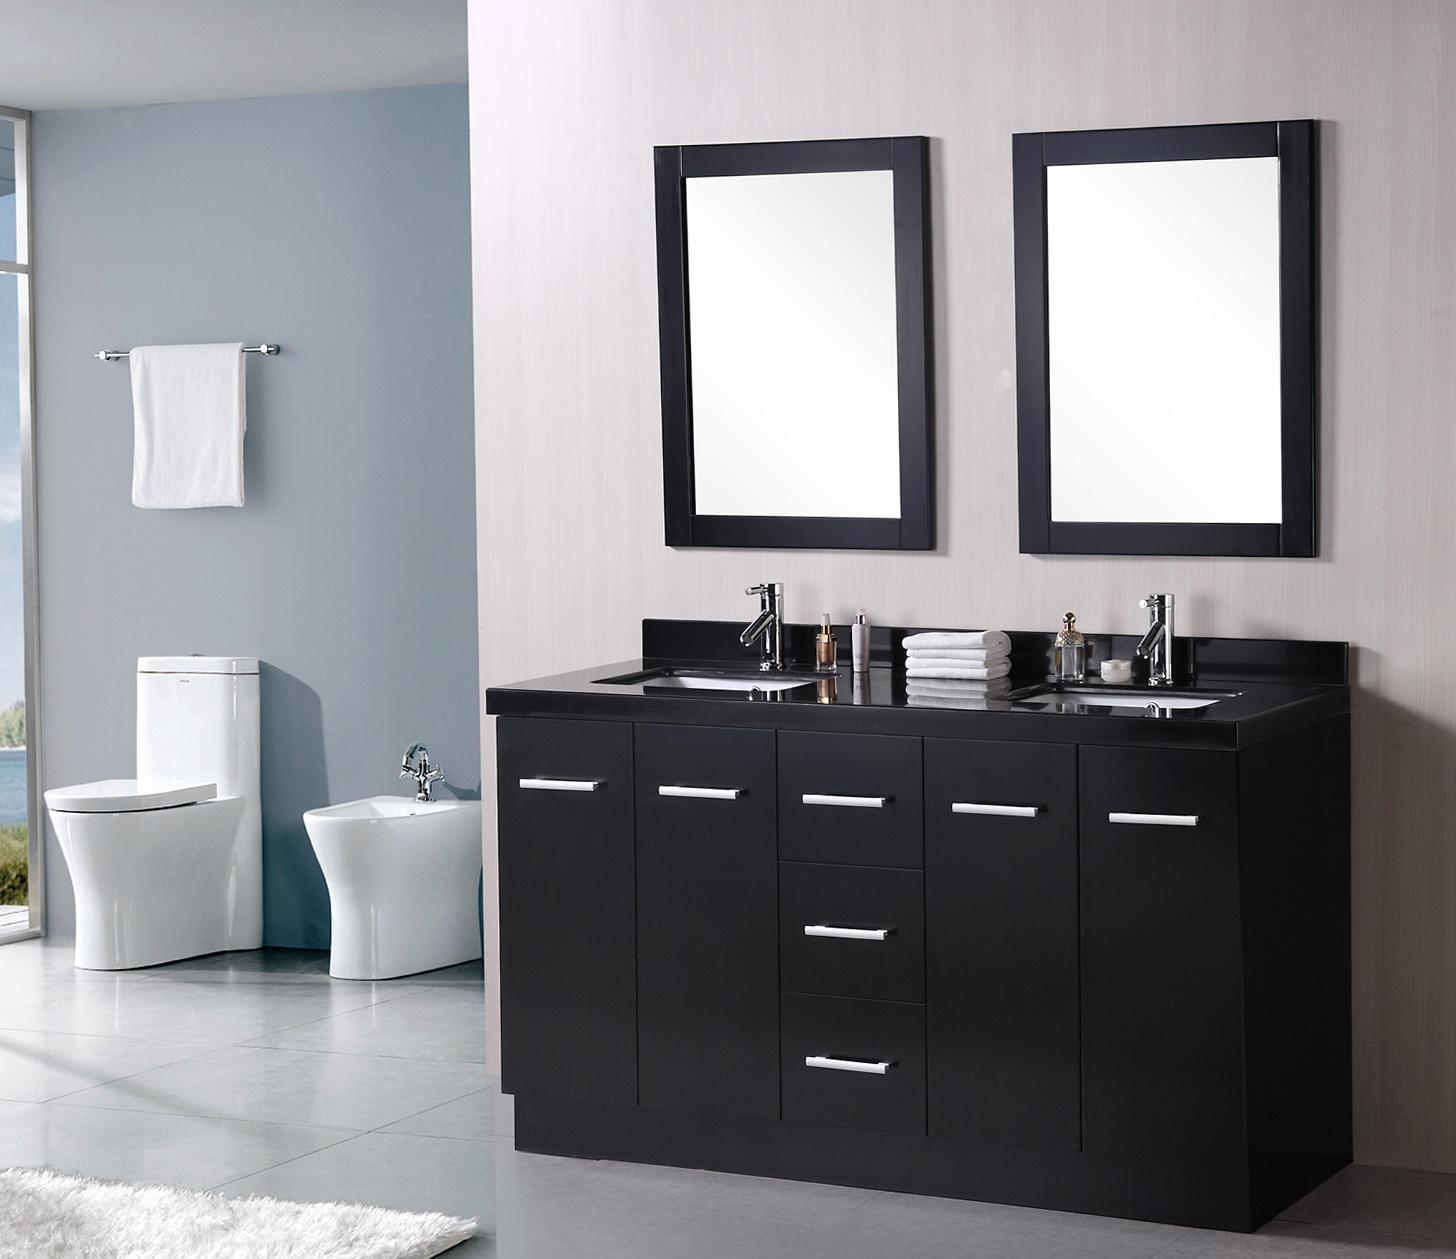 Bathroom Wall Mirrors Target  Home Design Ideas